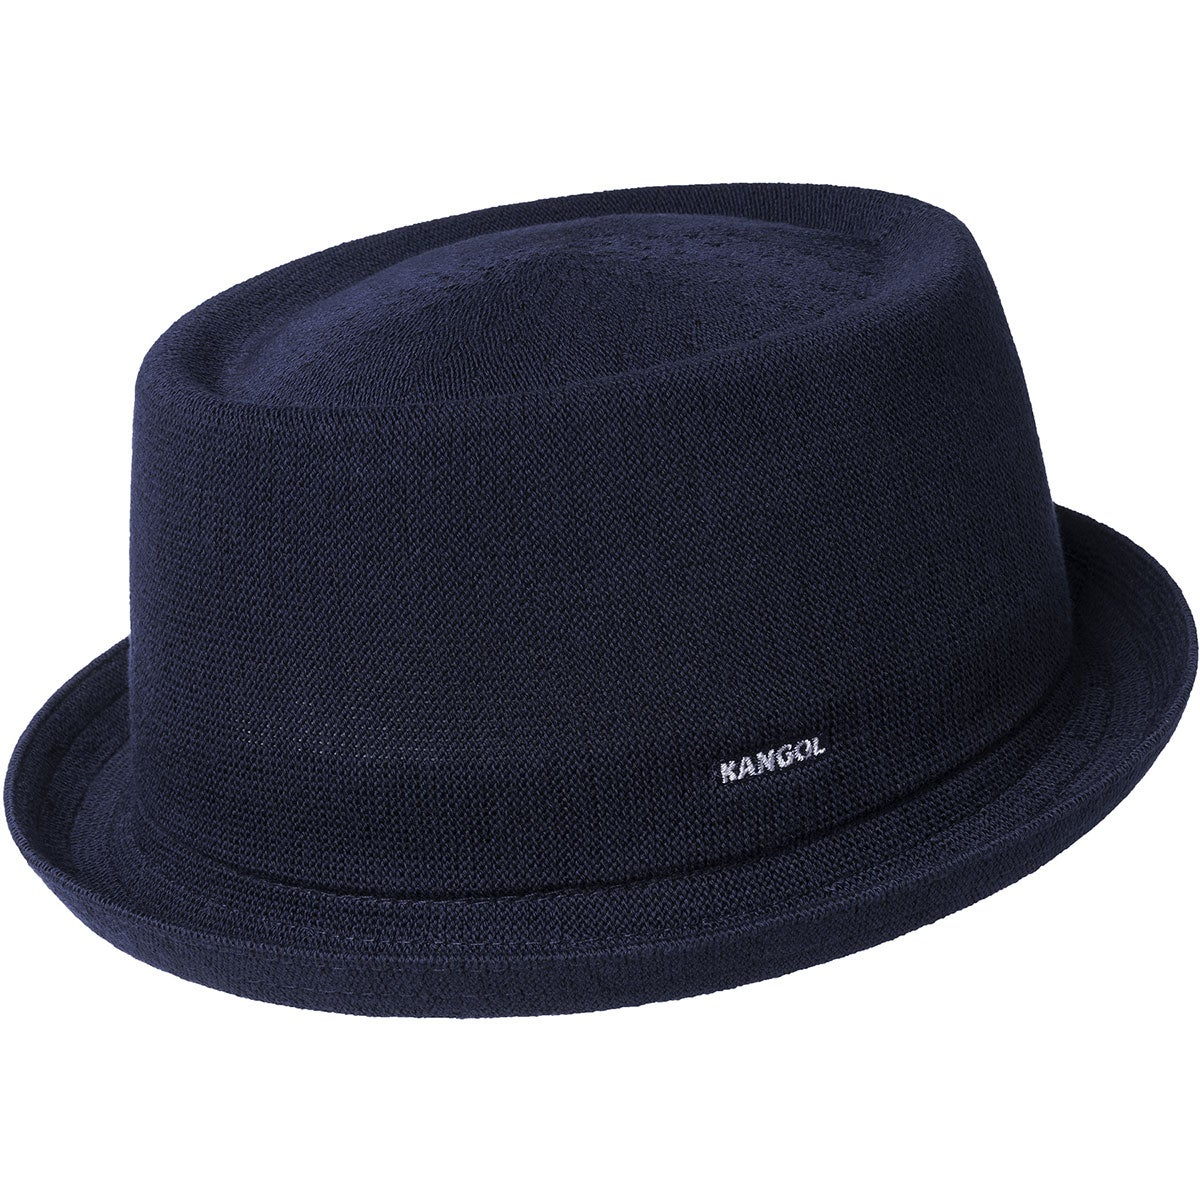 80s Hats, Caps, Visors, Buckets | Women and Men Bamboo Mowbray $64.00 AT vintagedancer.com